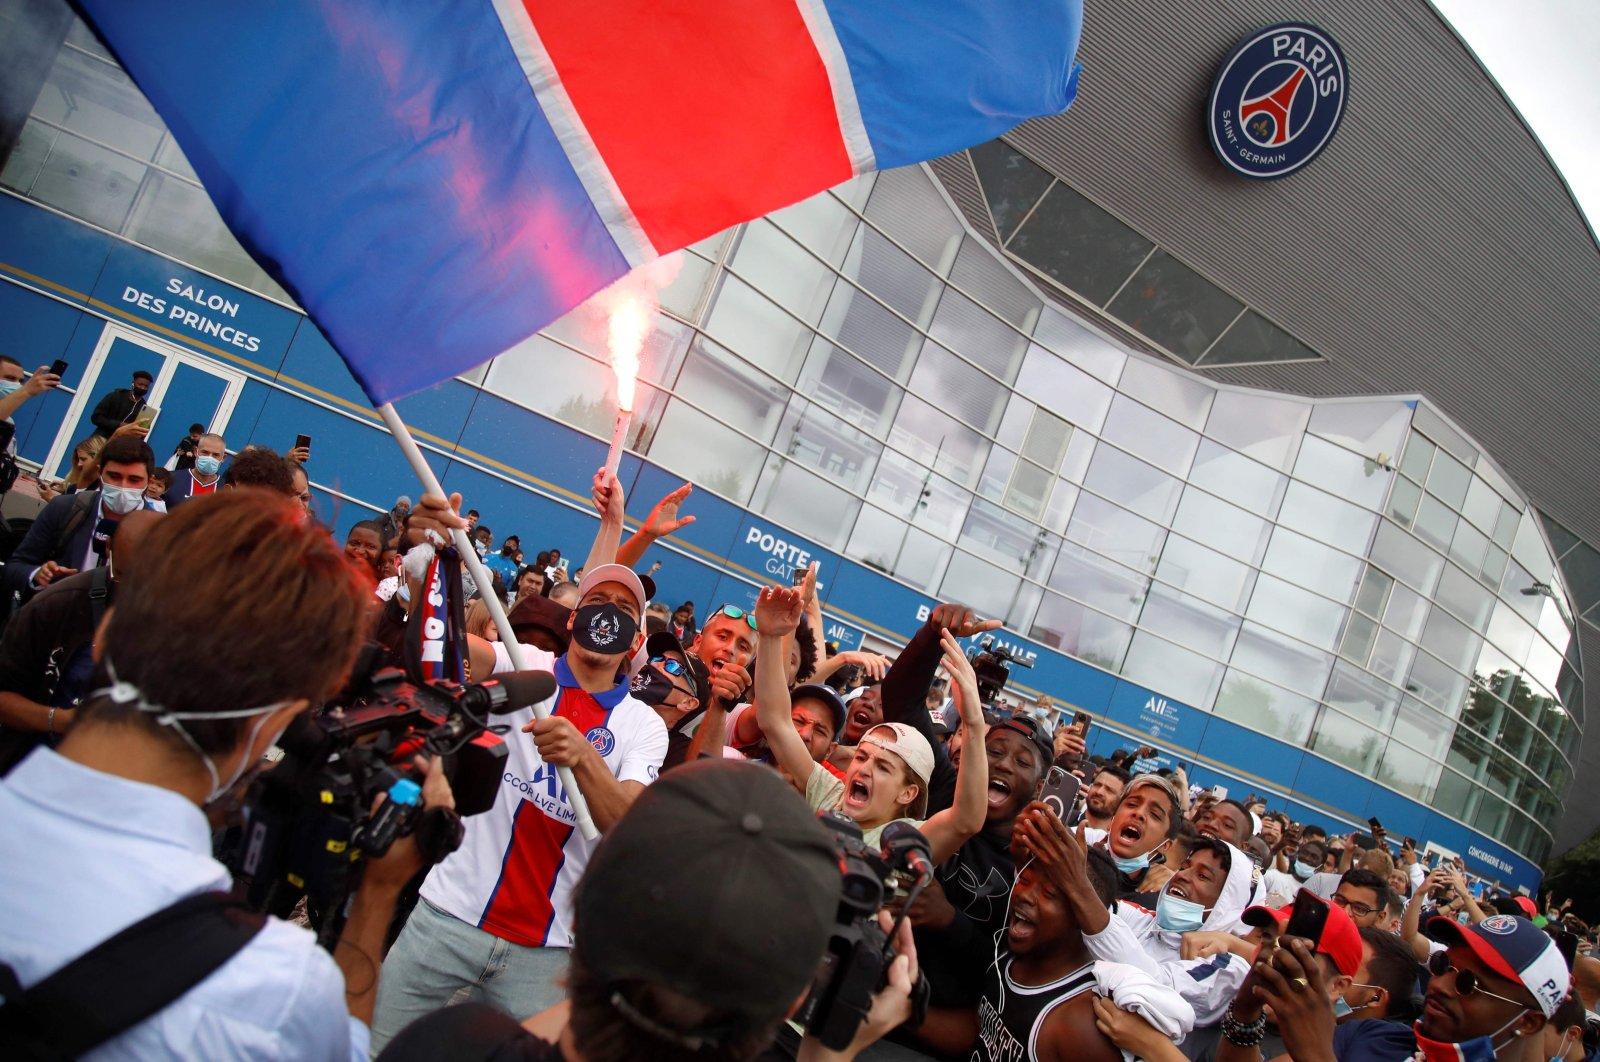 Supporters cheer outside French football club Paris Saint-Germain's (PSG) Parc des Princes stadium in Paris, France, Aug. 10, 2021. (AFP Photo)